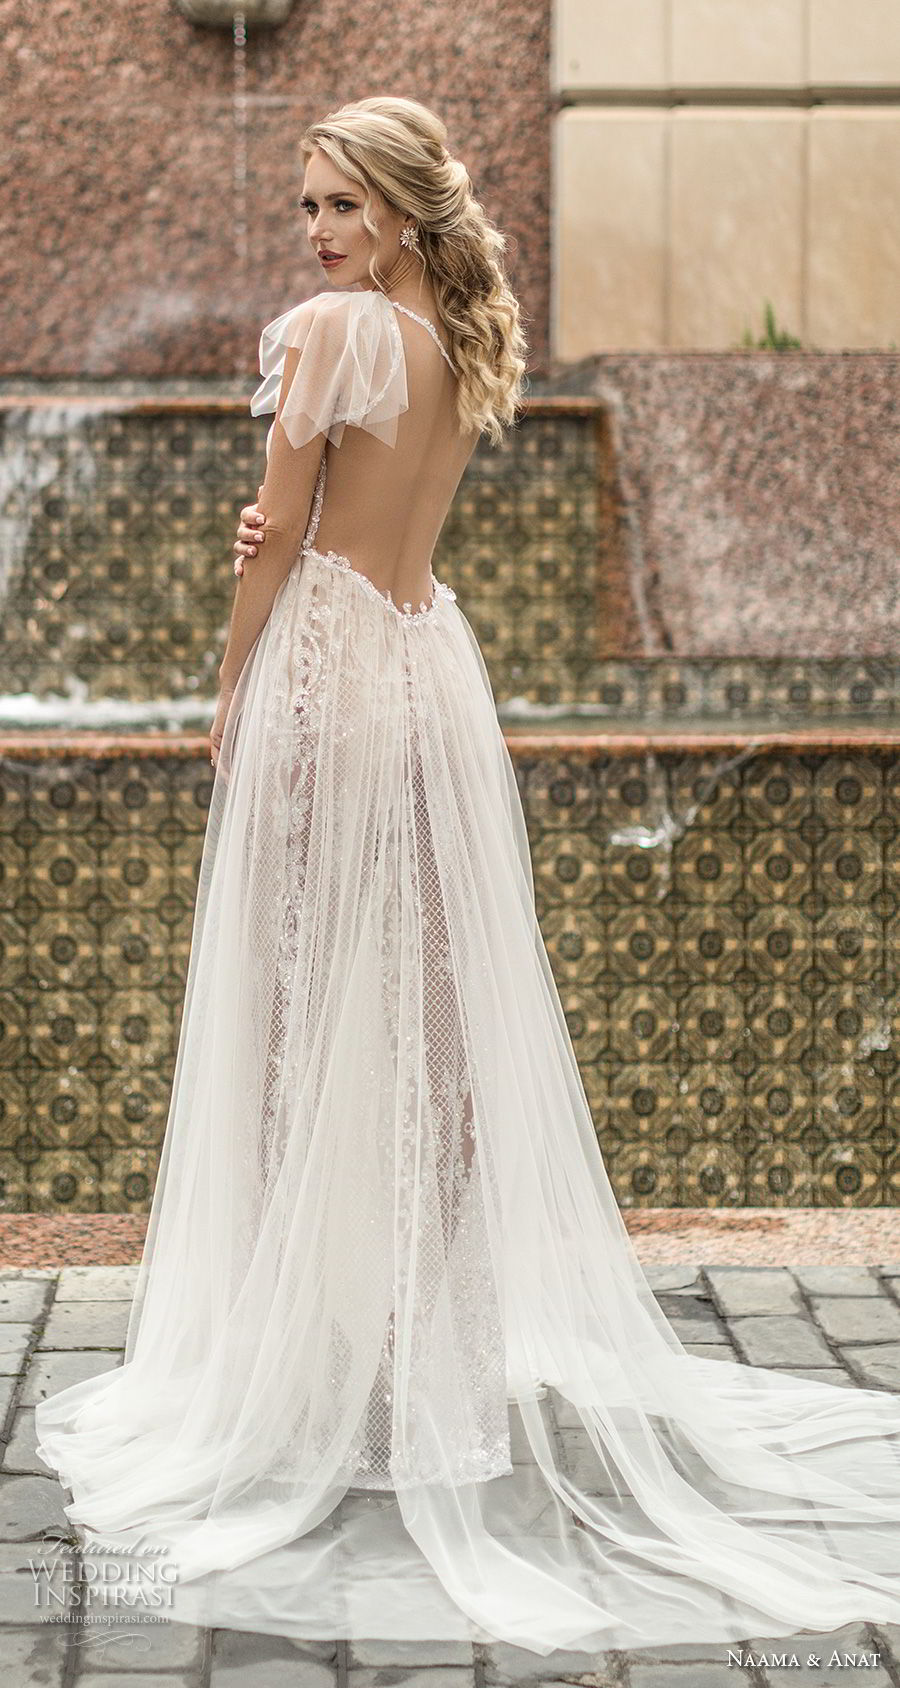 naama anat spring 2019 bridal one shoulder slope neckline full embellishment slit skirt romantic sheath wedding dress a line overskirt sheer back chapel train (3) bv